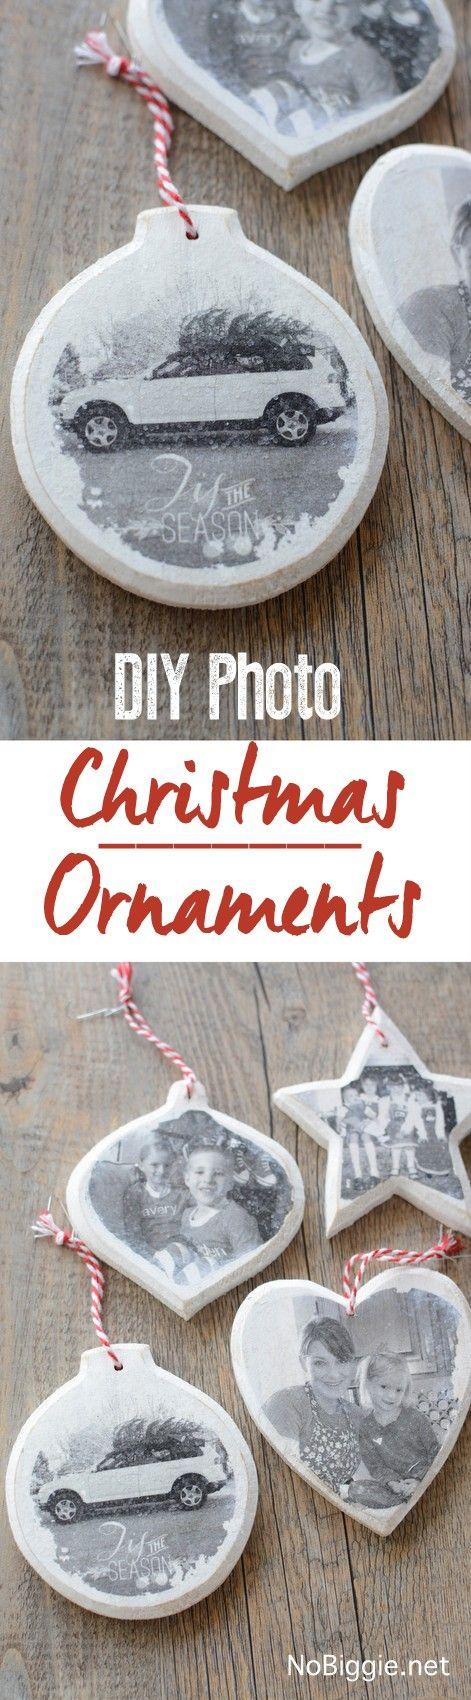 Transfer Cherished Photos Onto Wood Ornaments.